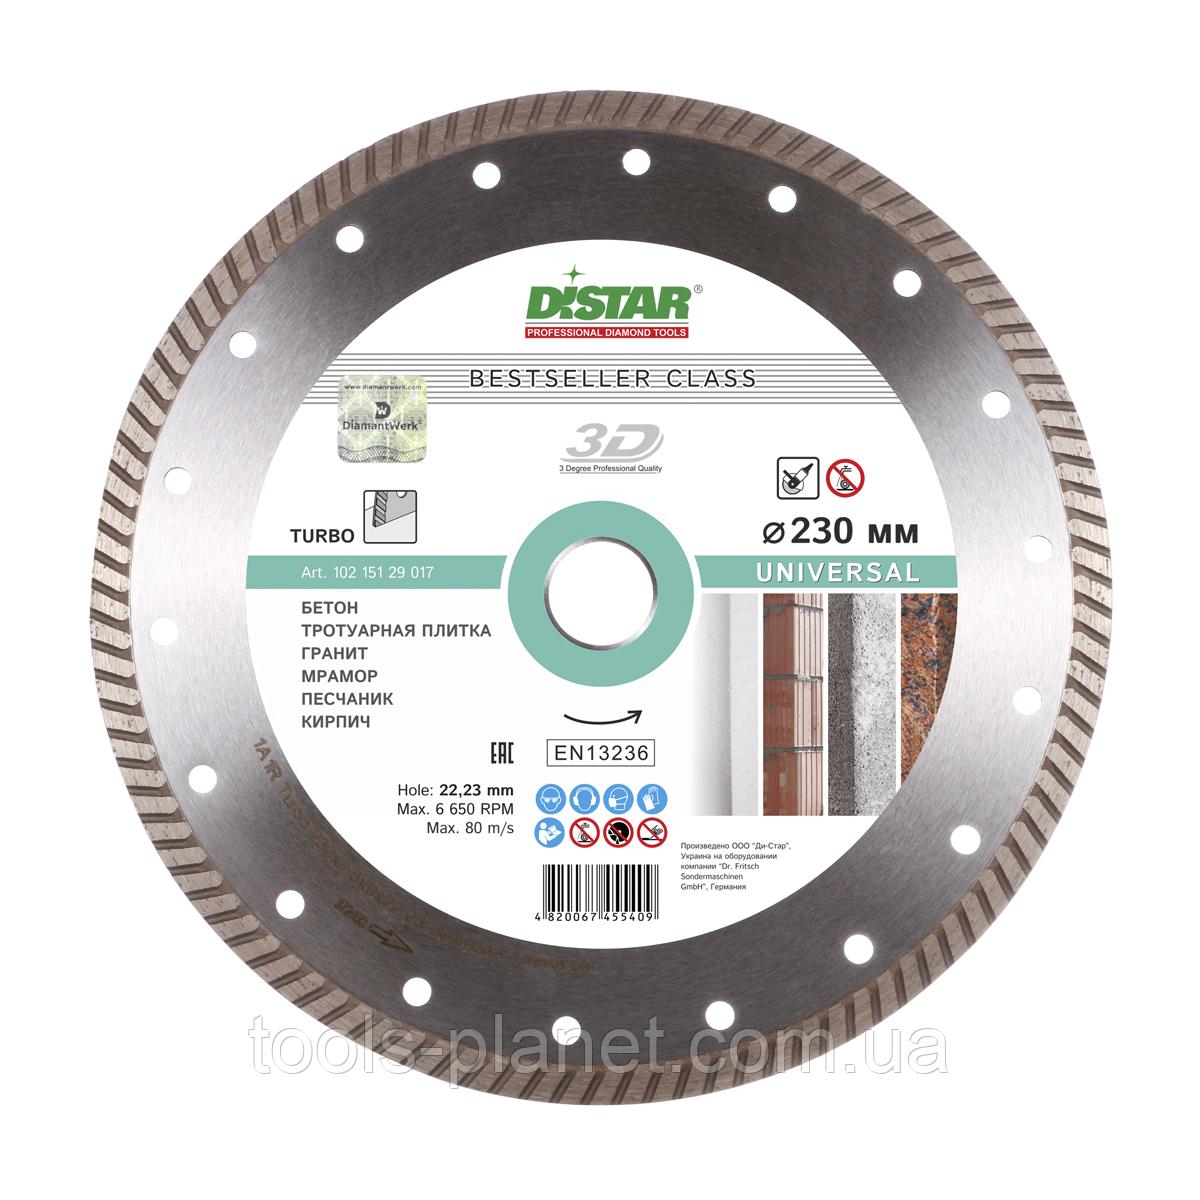 Алмазный диск Distar 1A1R Turbo 230 x 2,6 x 9 x 22,23 Bestseller Universal 3D (10215129017)